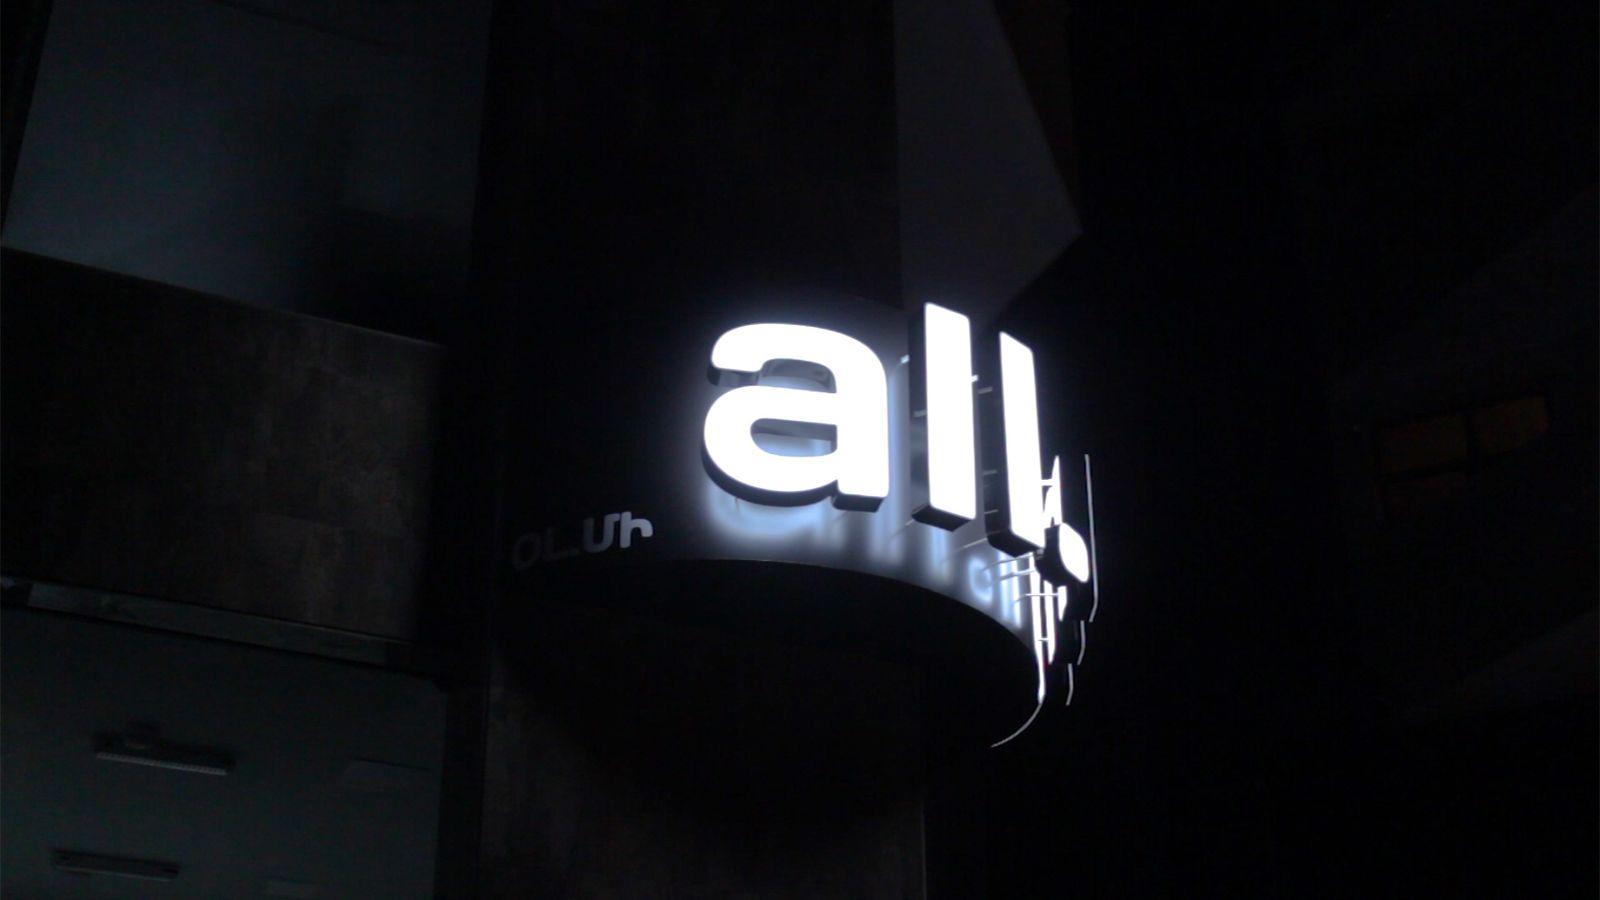 Acrylic whole face illuminated letters